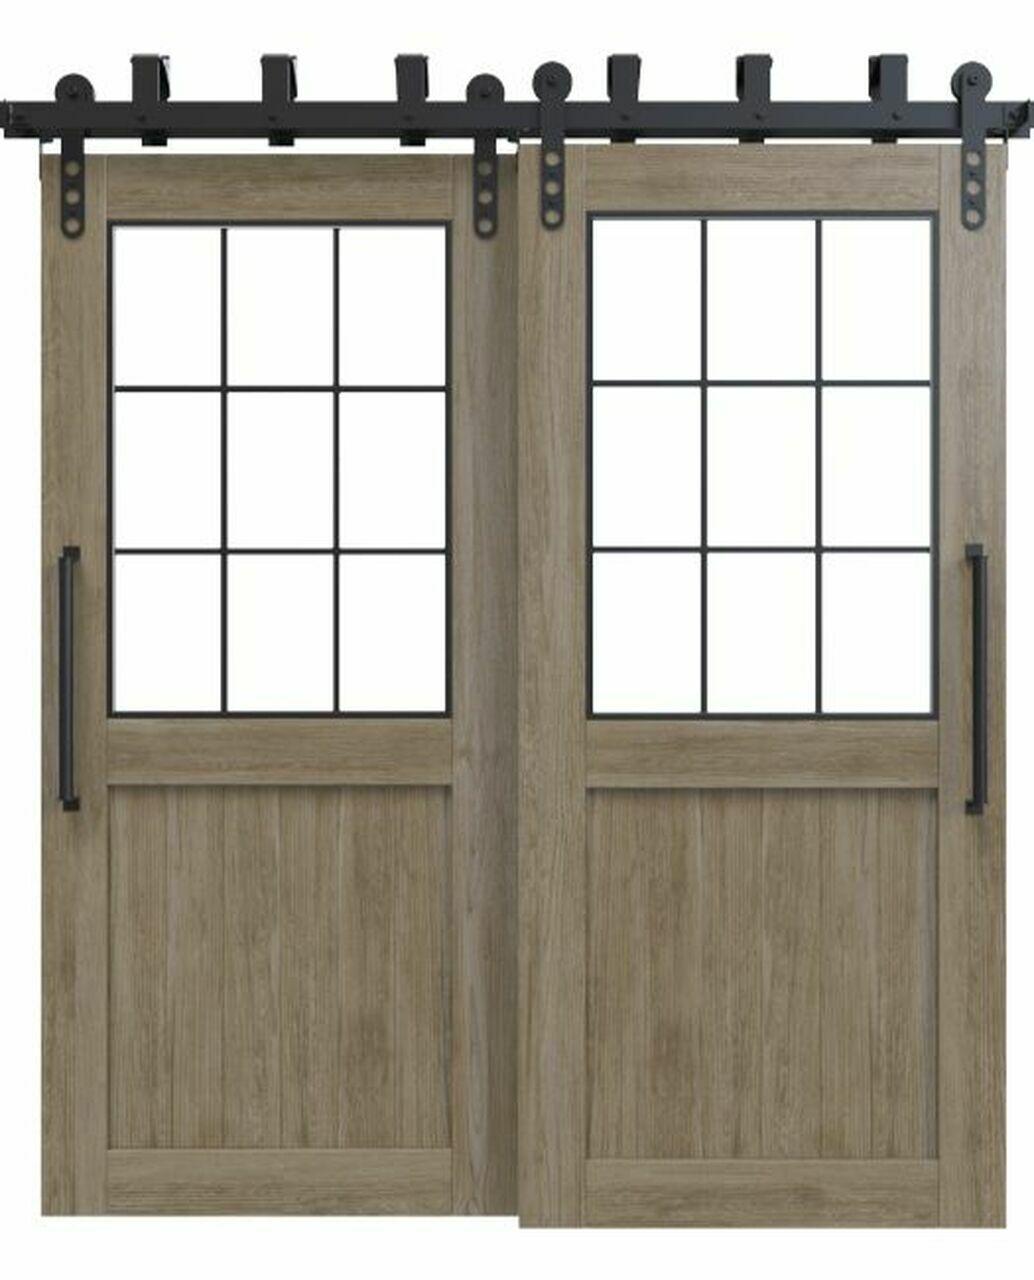 wood bypass barn door with glass window